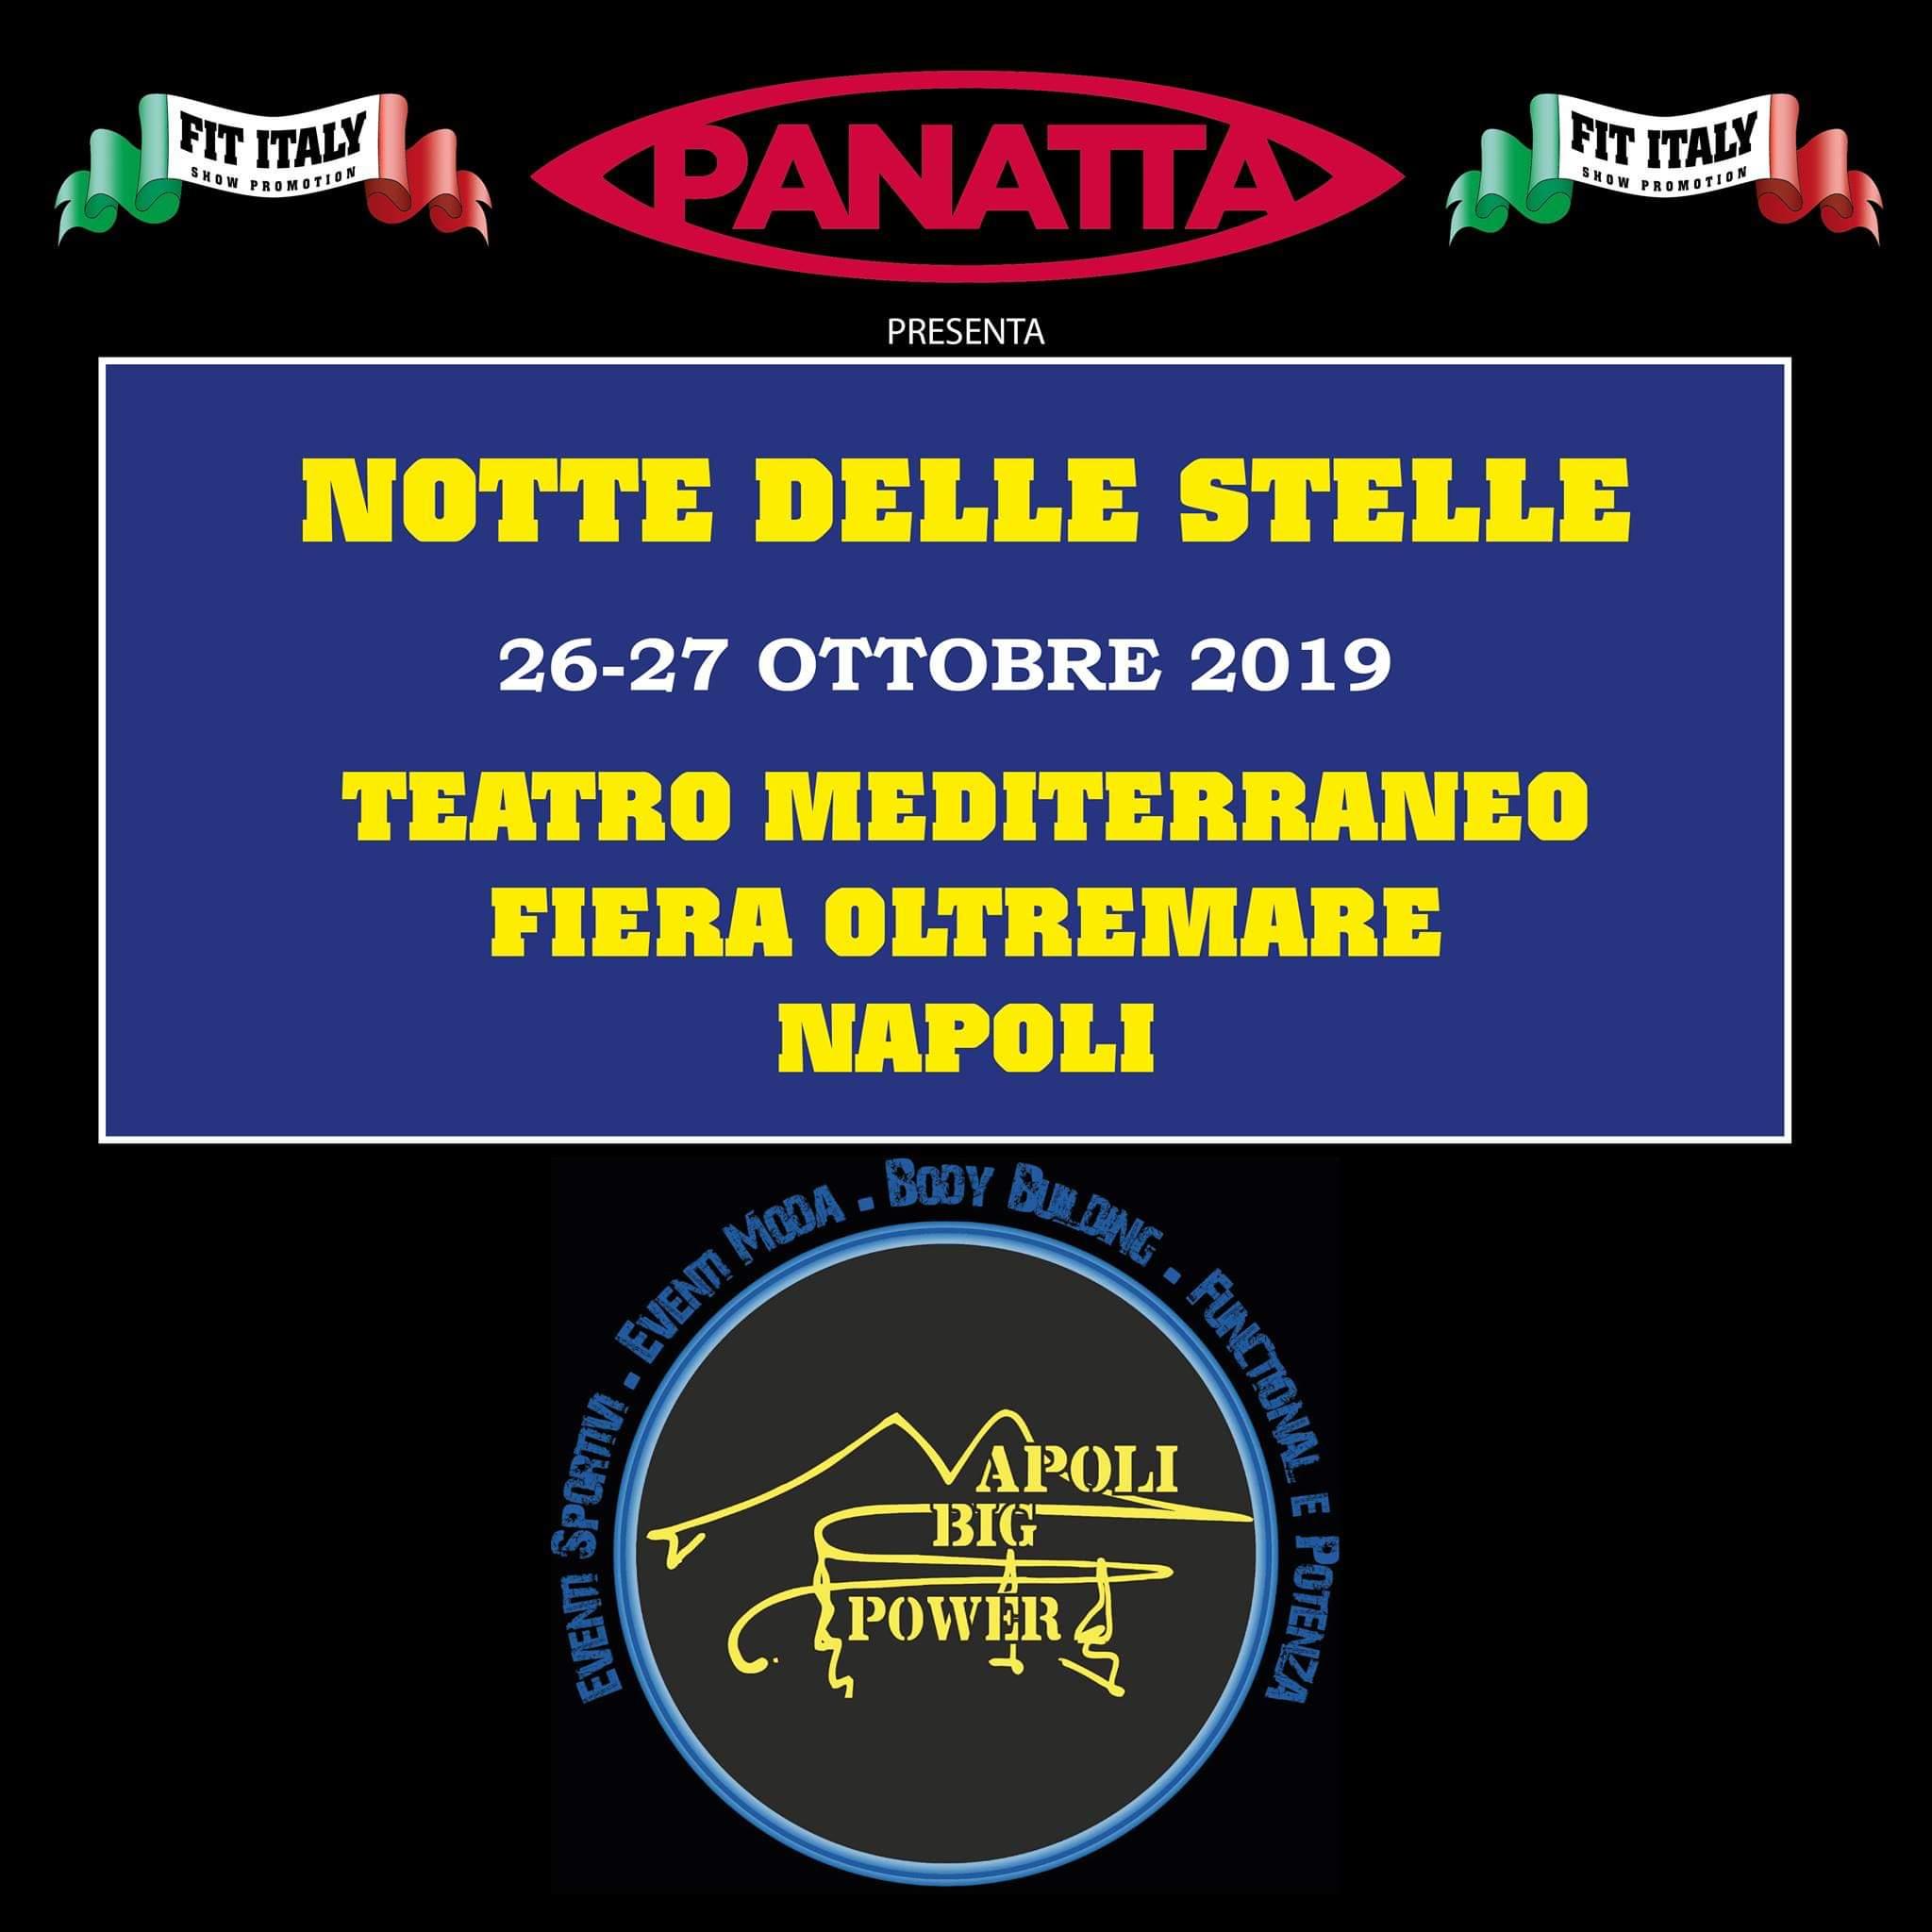 2019 notte delle stelle ifbb italia